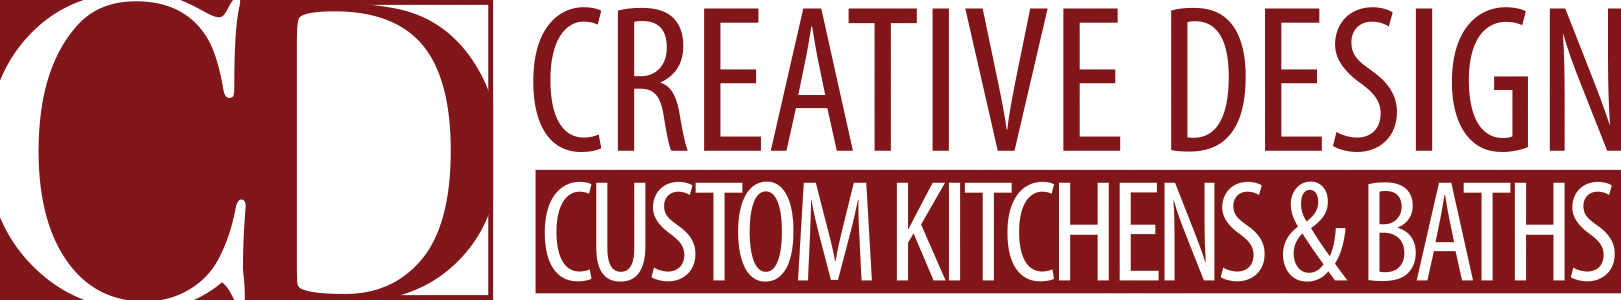 Creative Design Custom Kitchens & Baths